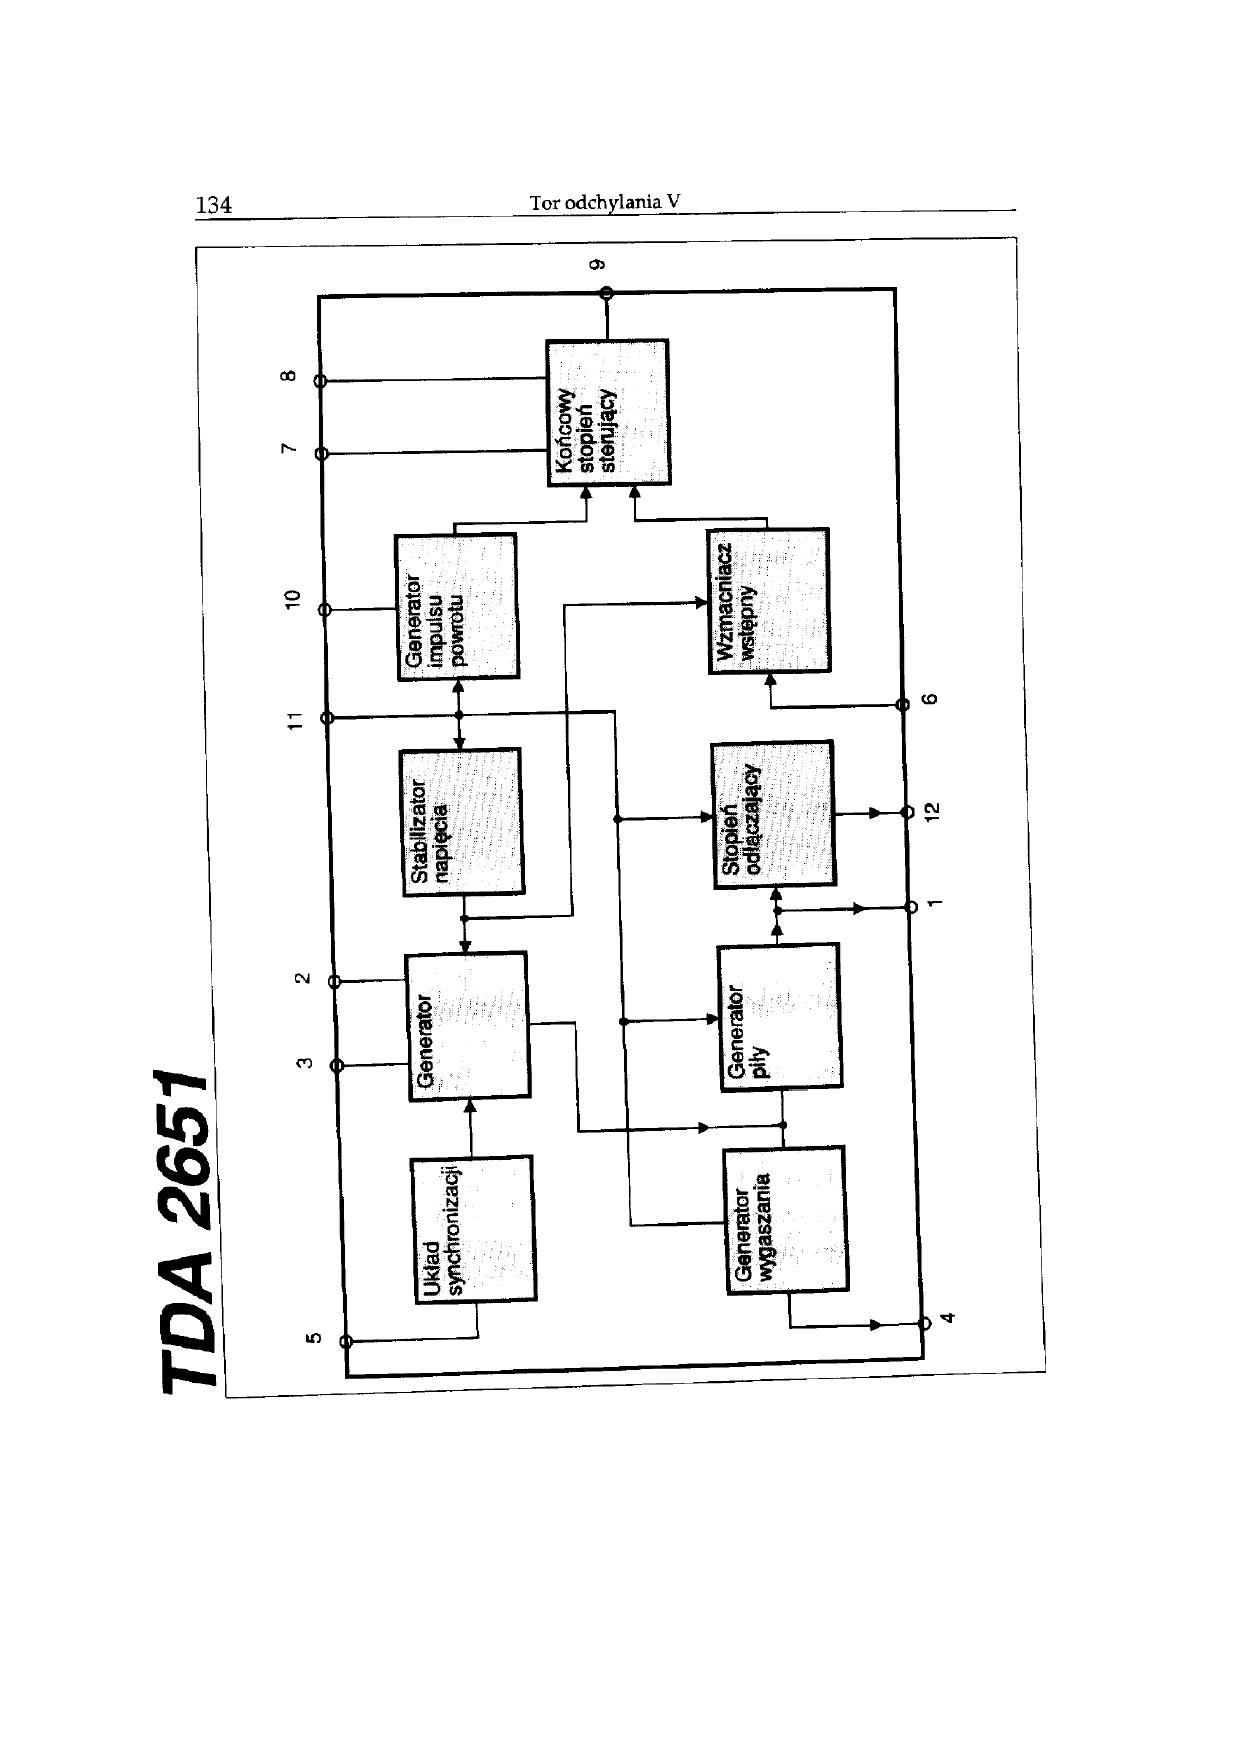 TDA2651 Datasheet